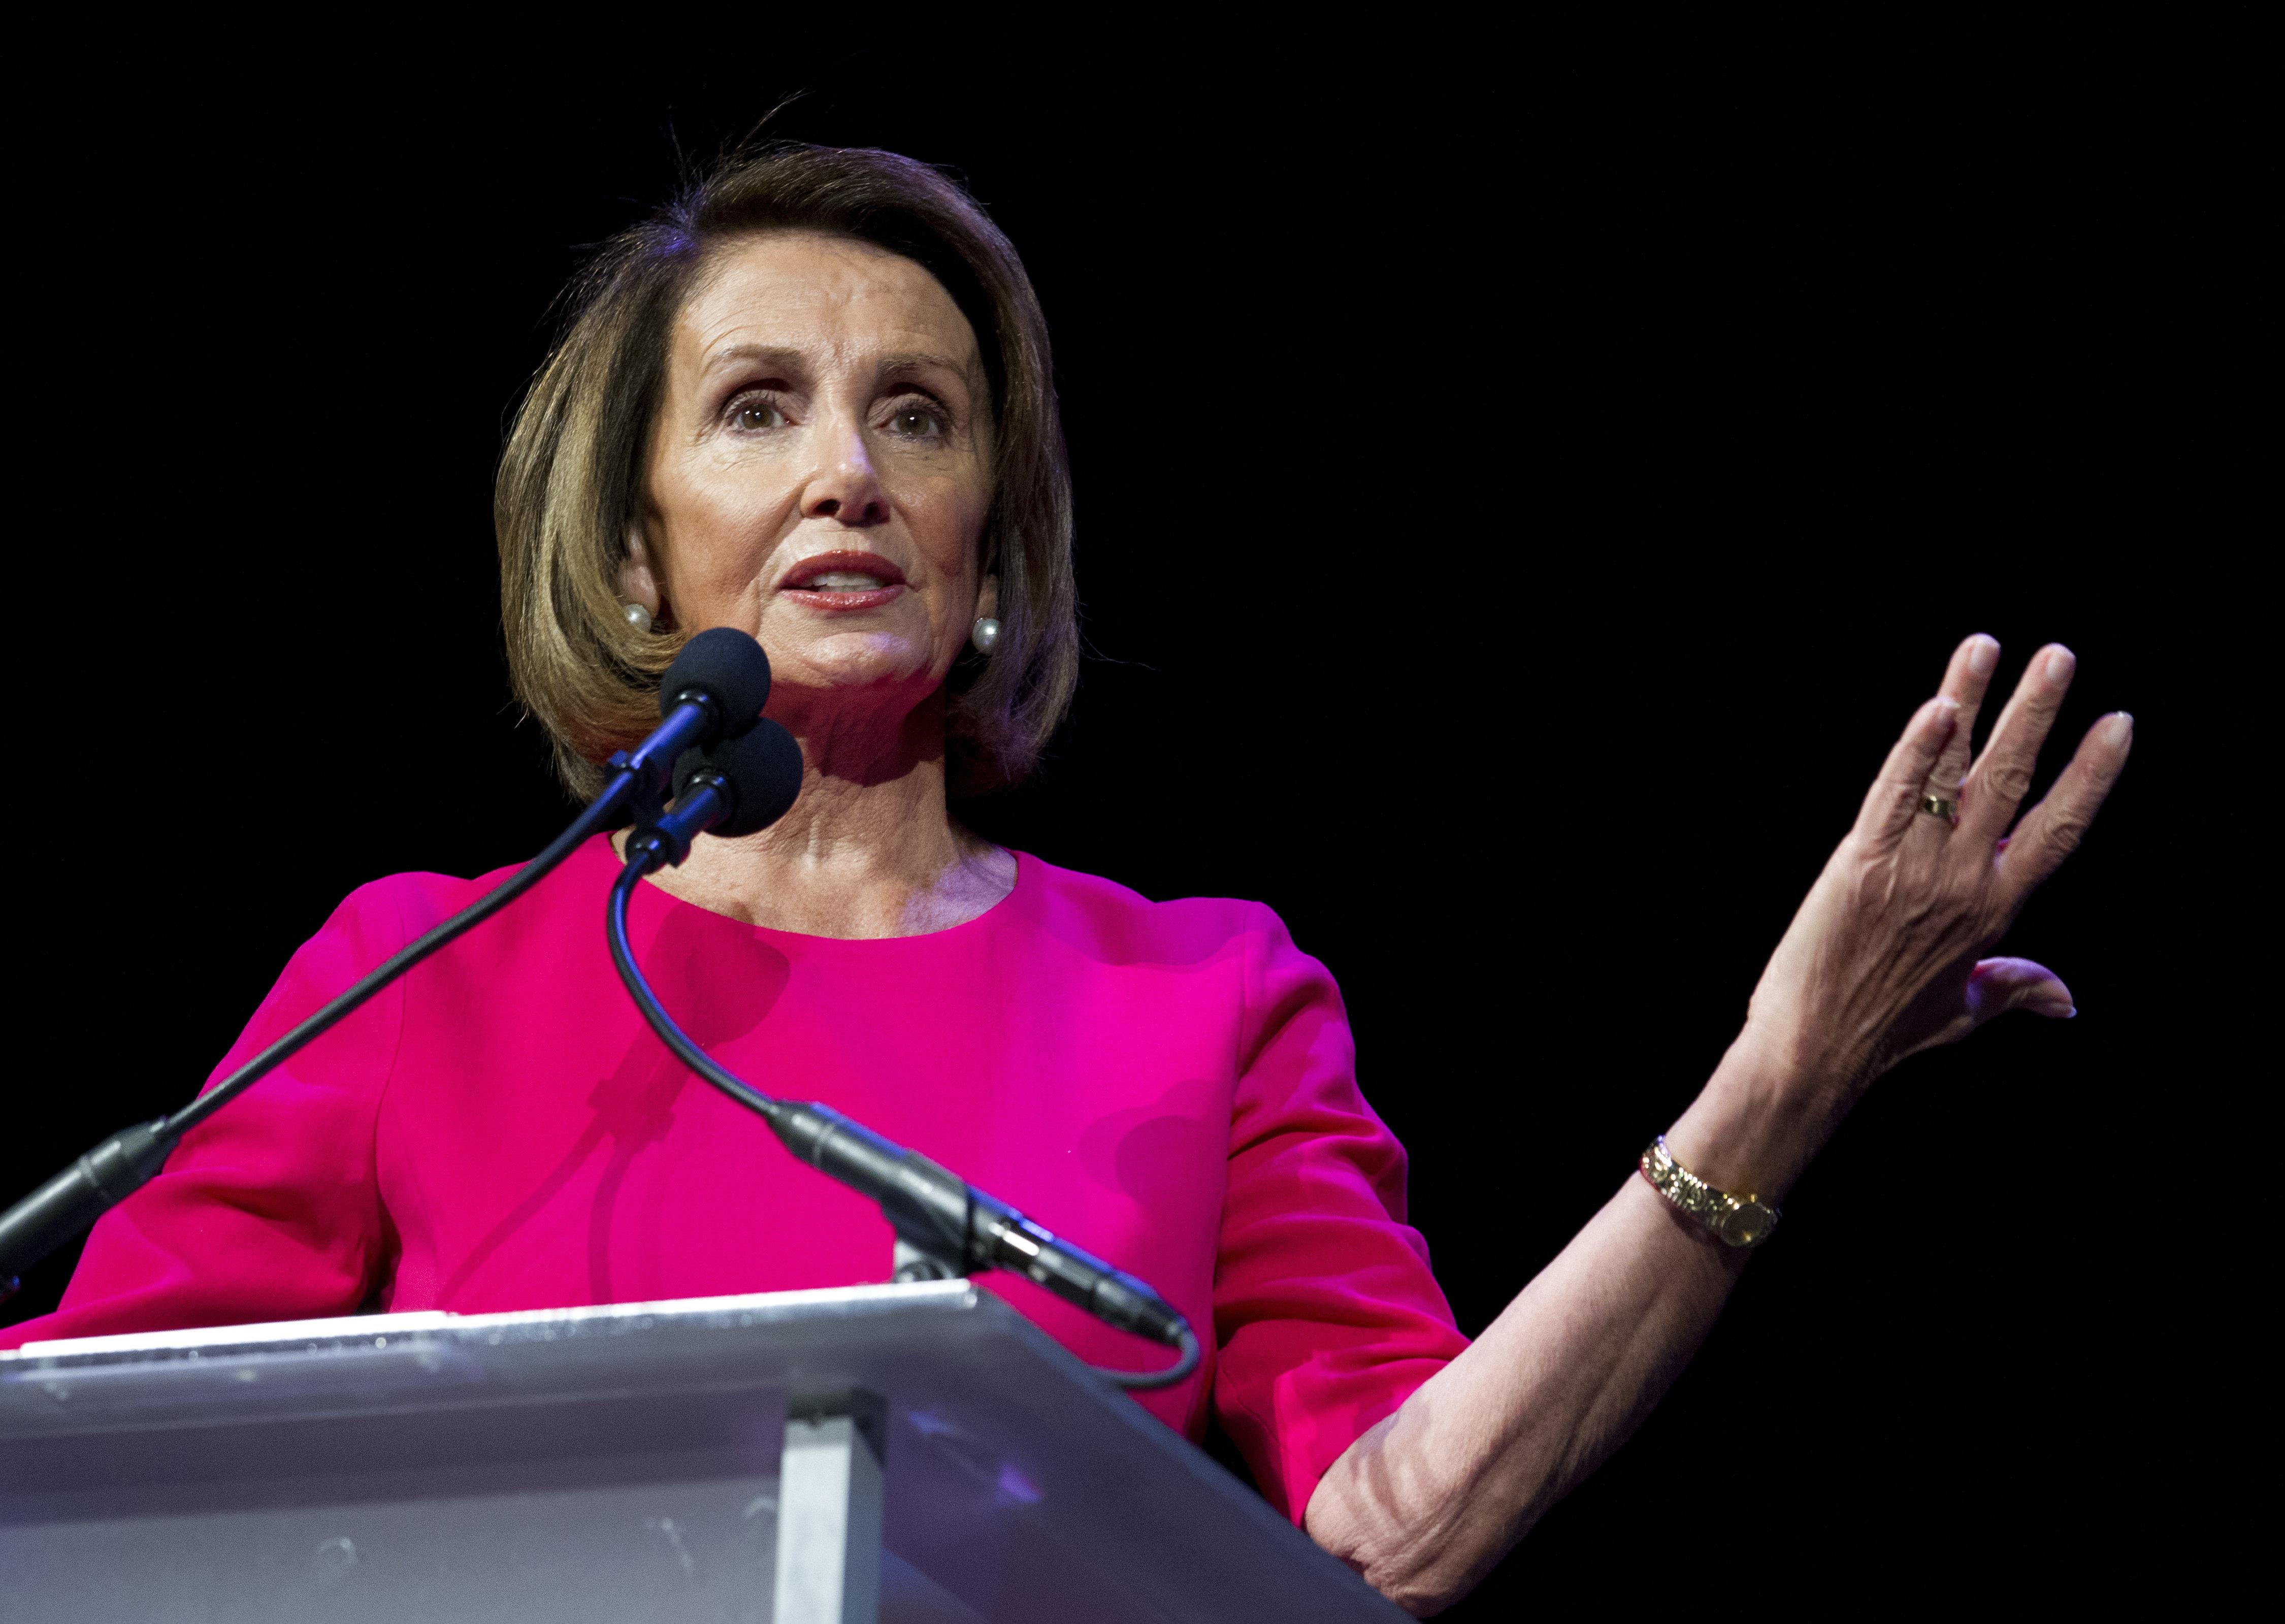 The House elected Nancy Pelosi as speakeron Thursday.